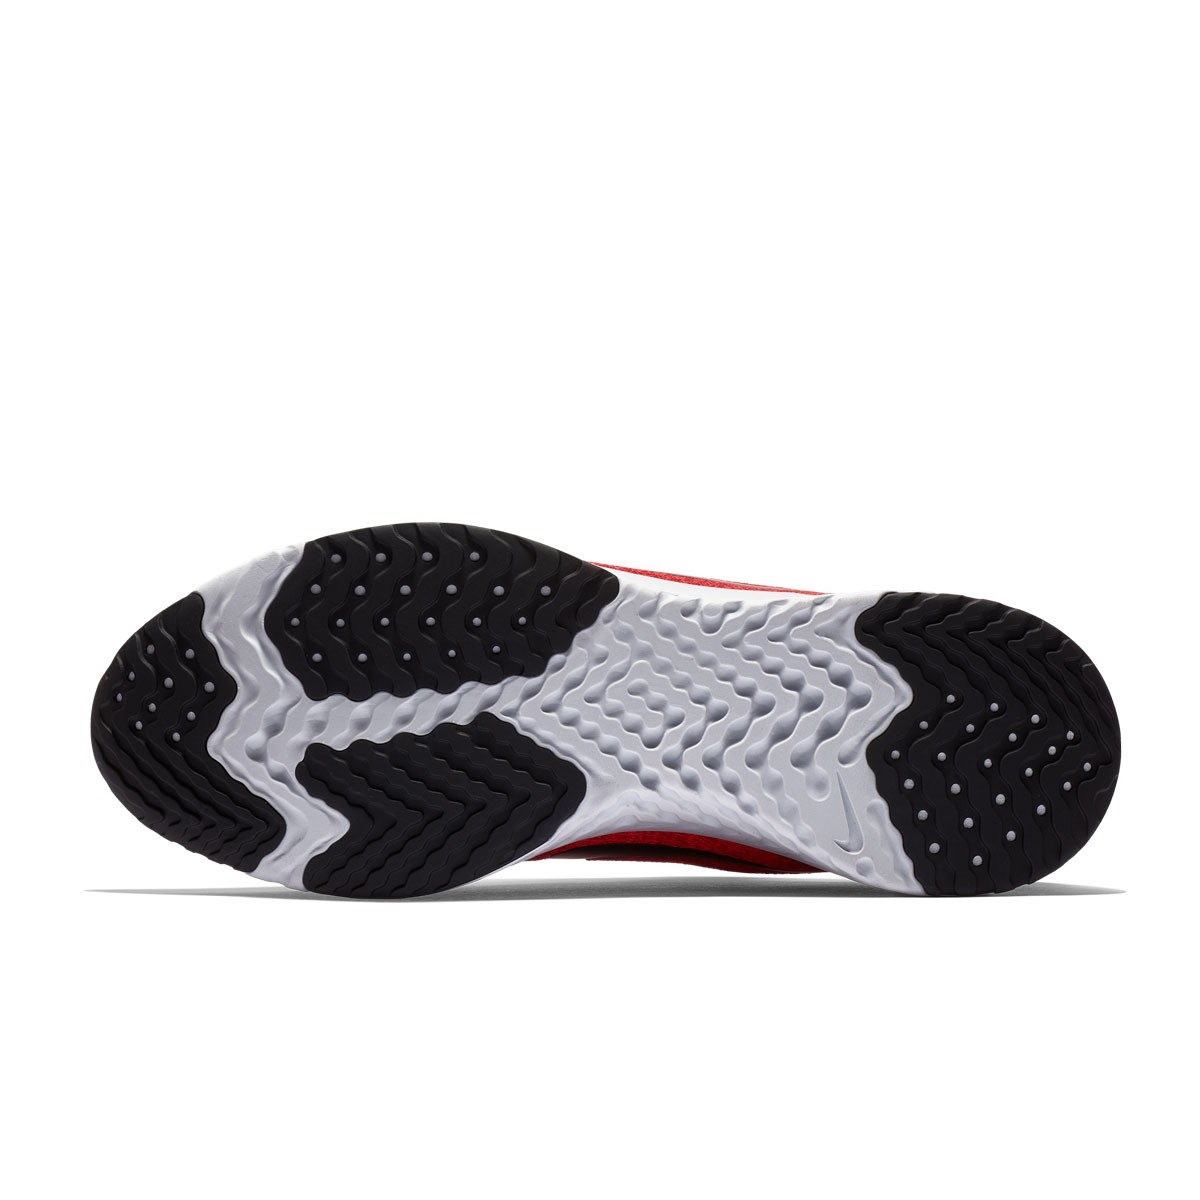 acheter en ligne a6c65 ae260 Nike Odyssey React GS 'Red'